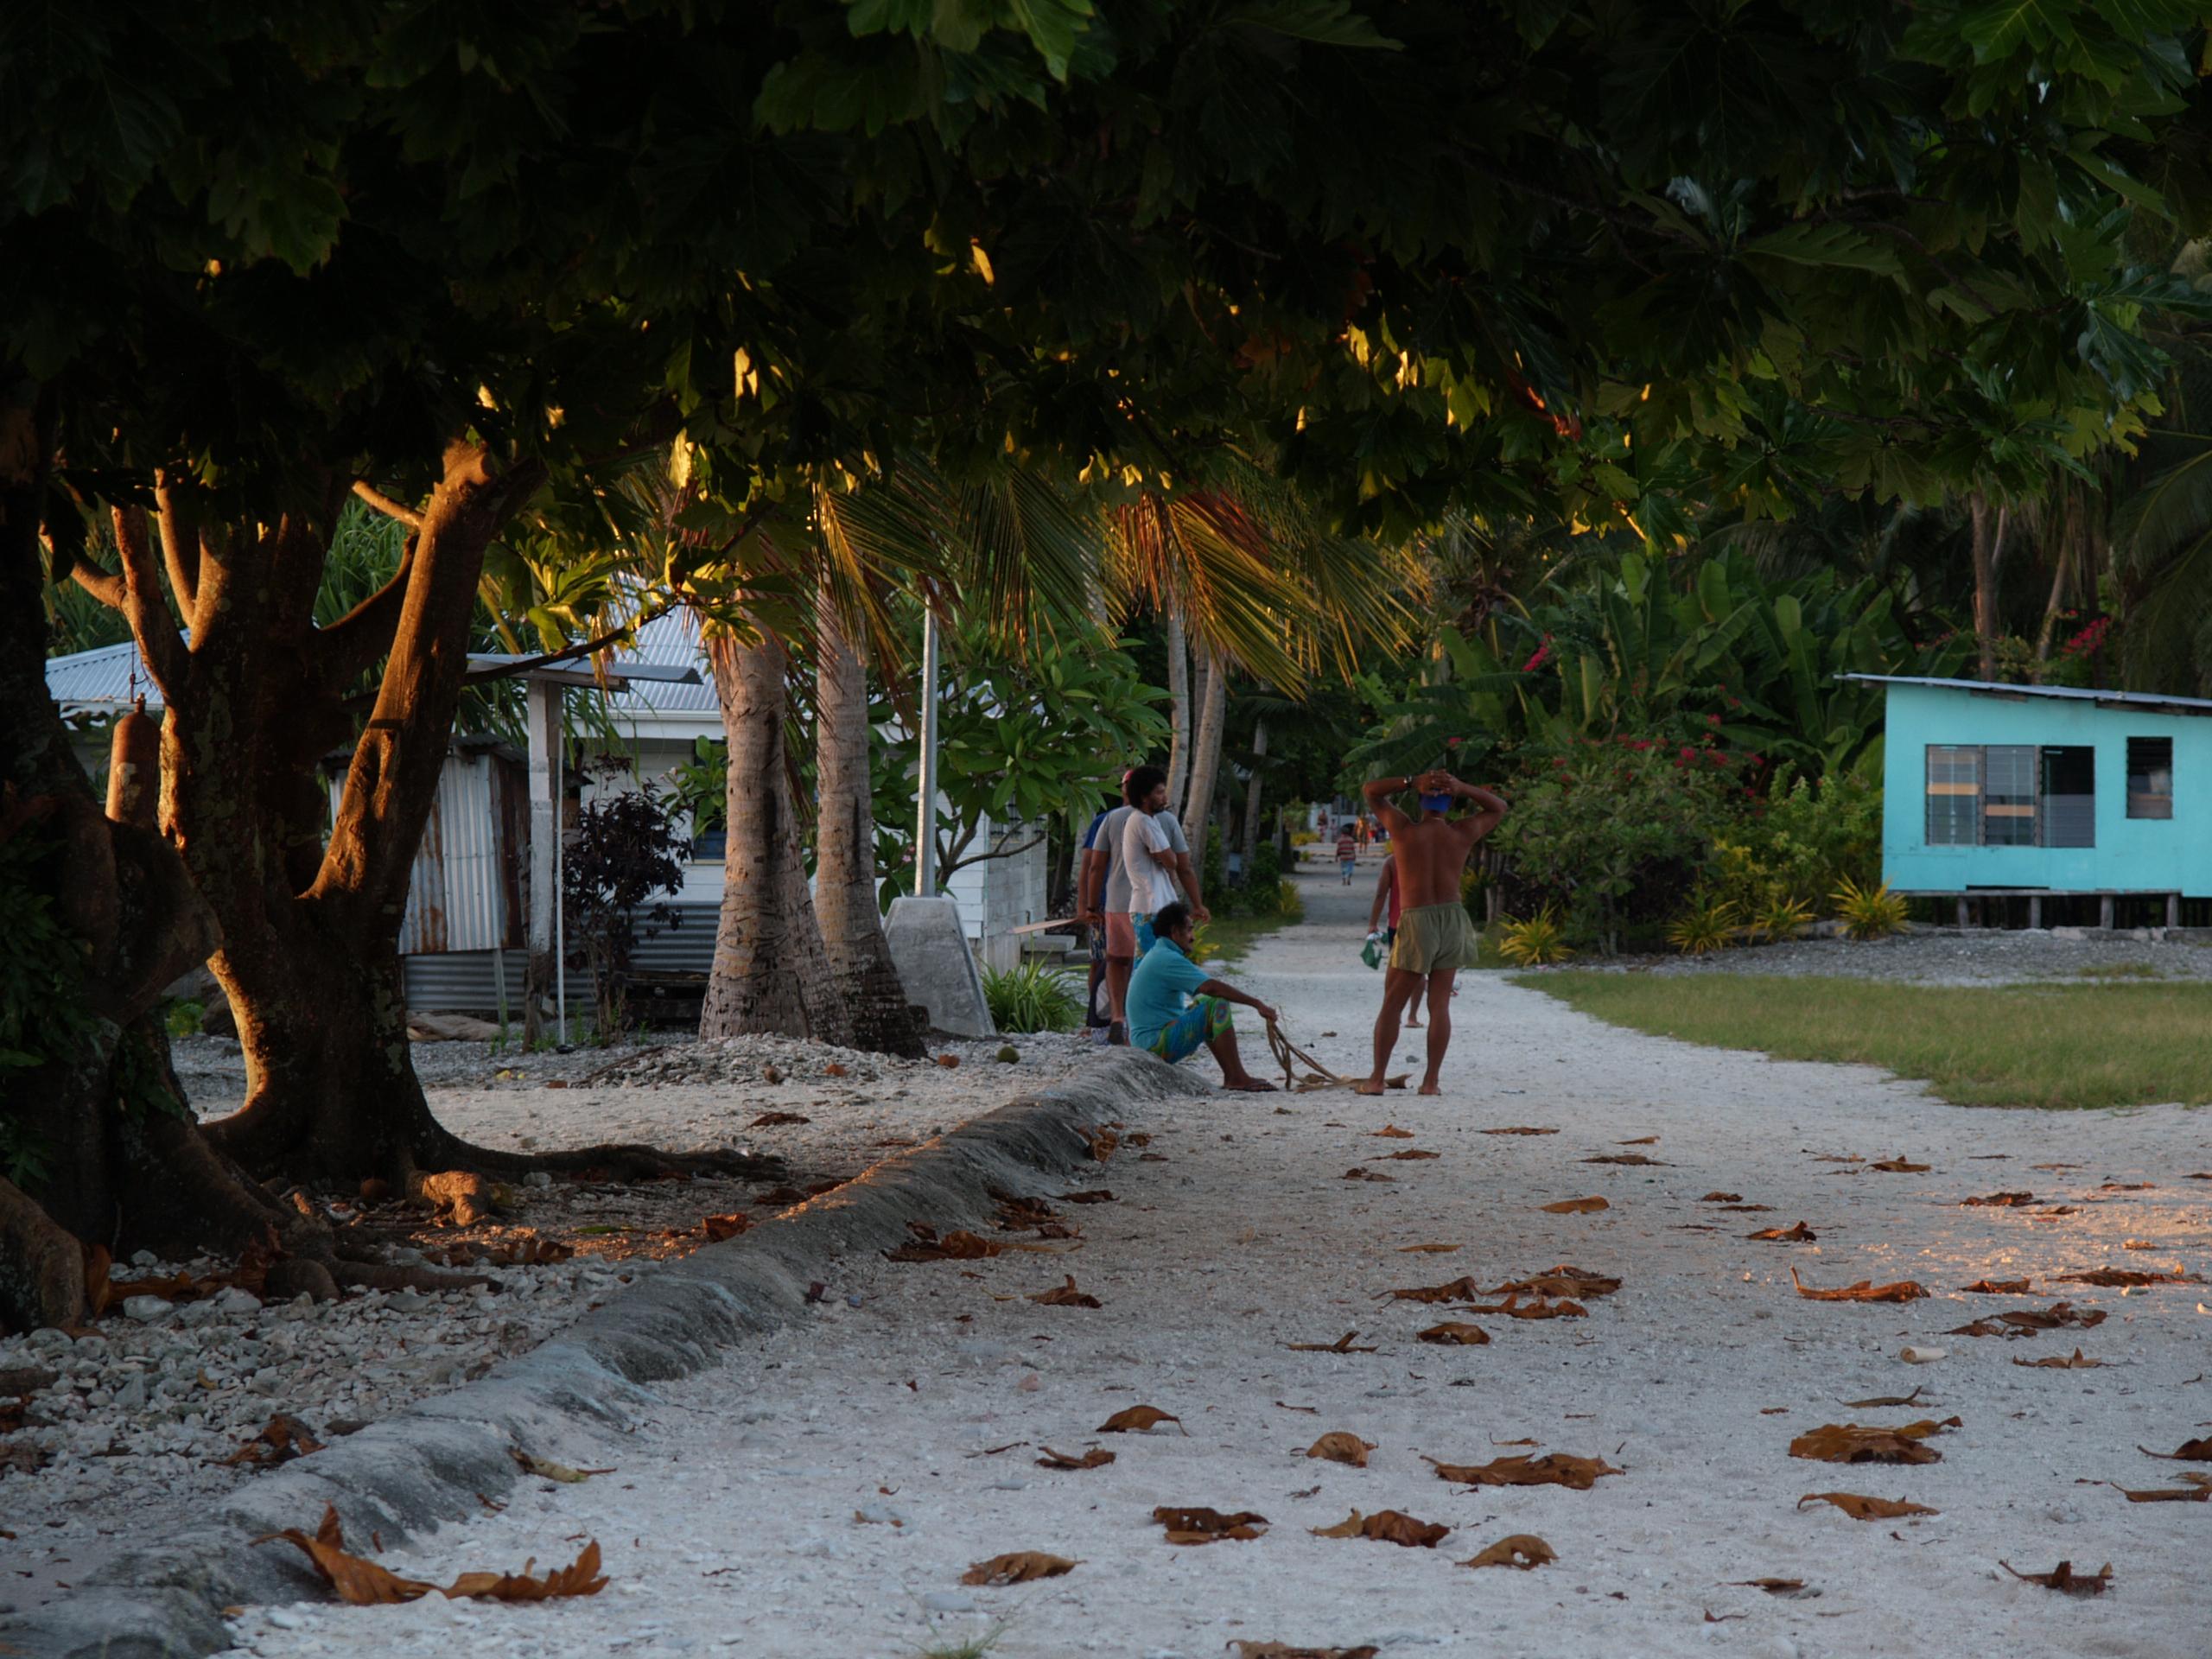 At dawn on a street on Atafu Atoll, Tokelau. Photo taken on July 10, 2007.